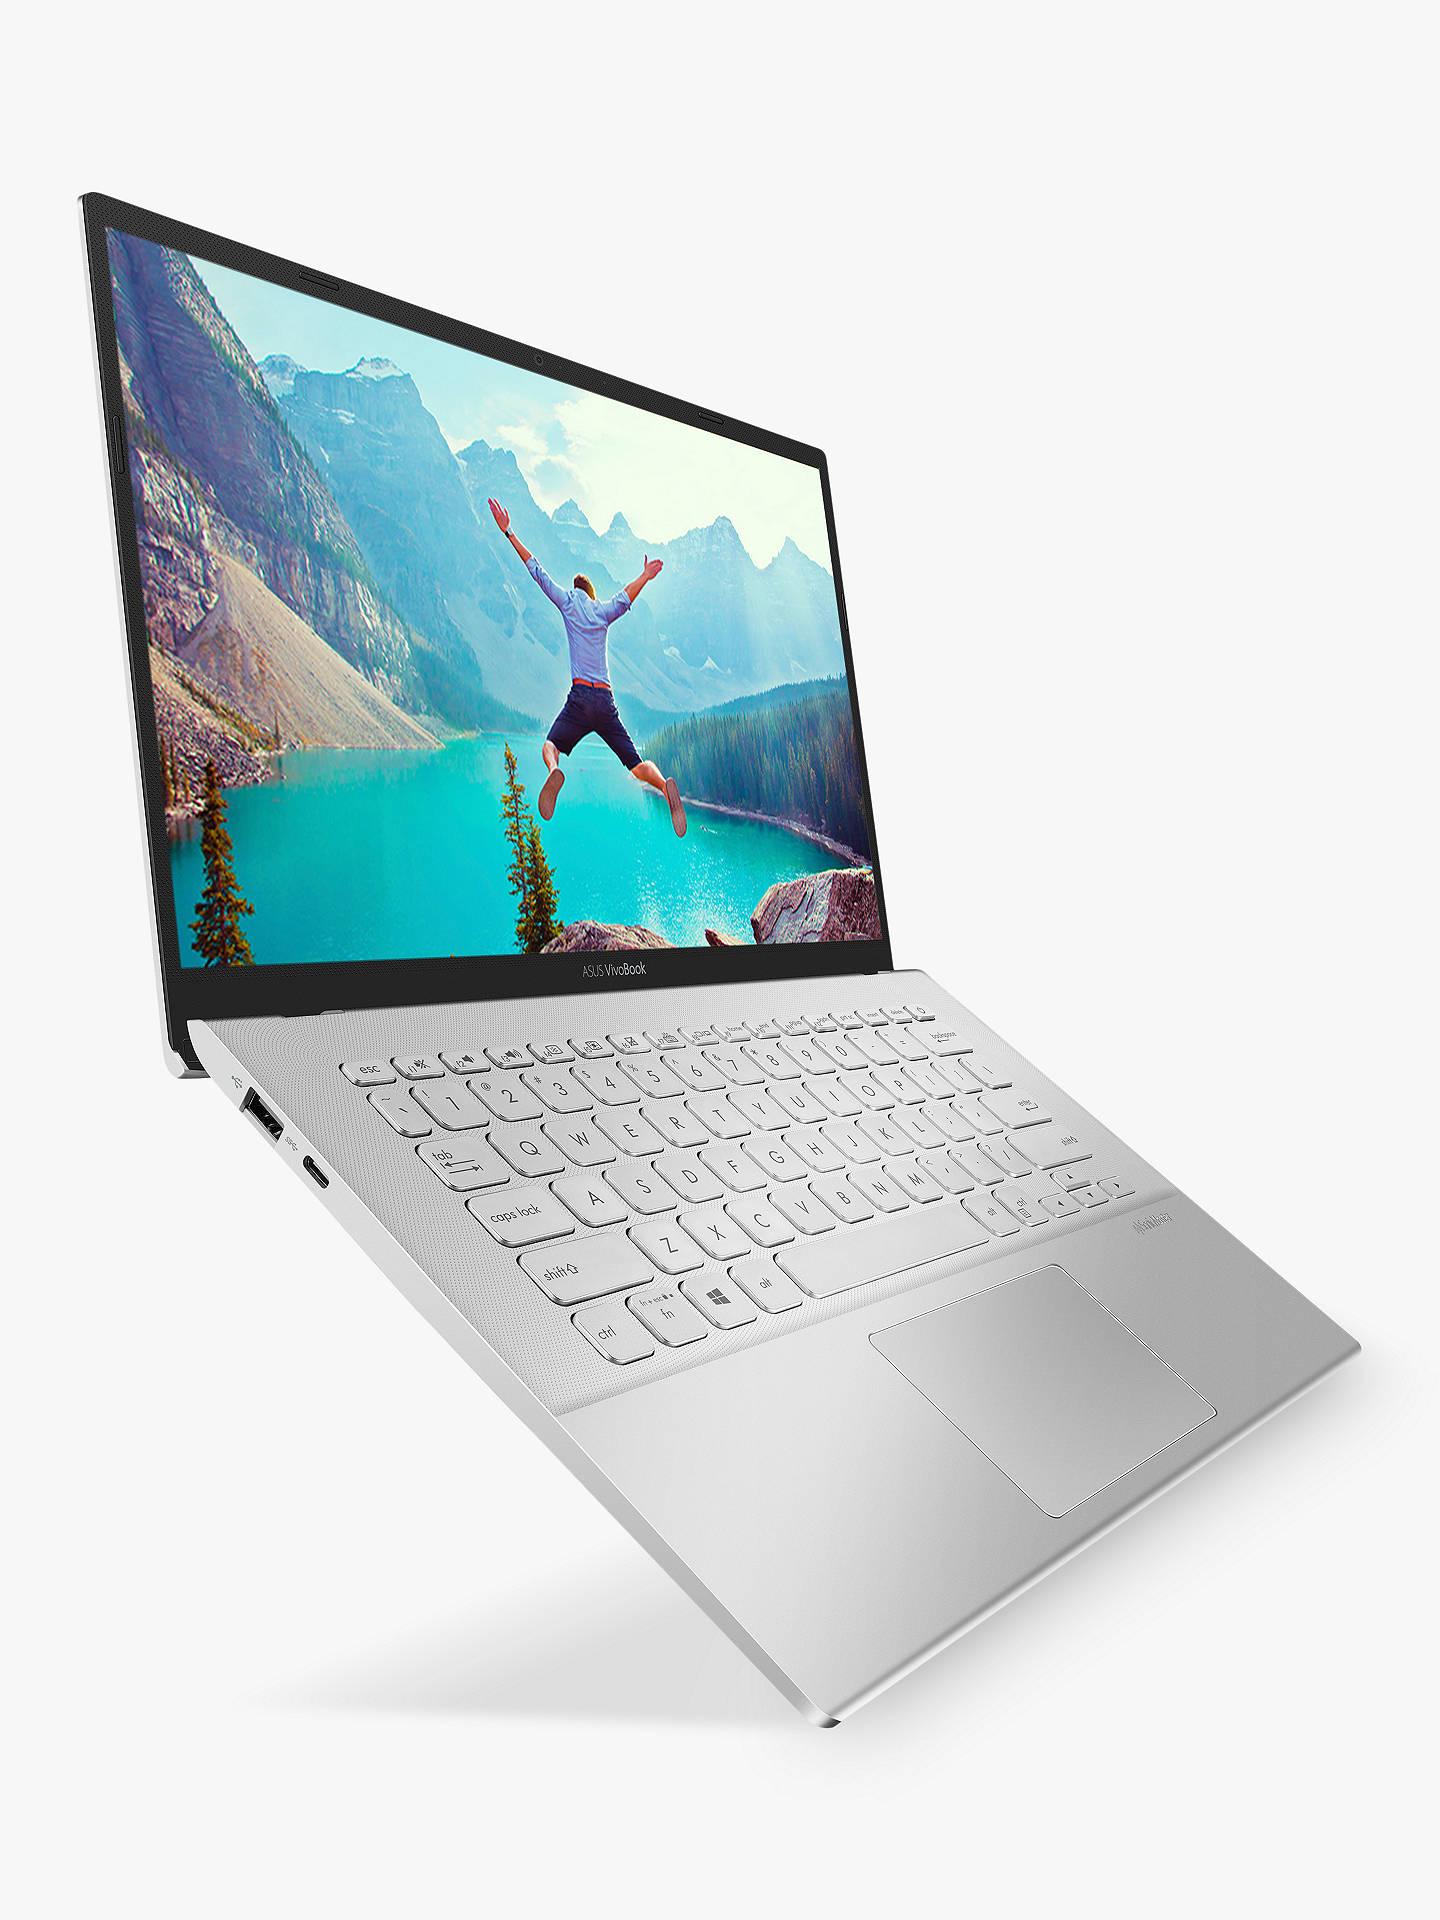 ASUS VivoBook 14 X420UA-EK019T Laptop, Intel Core i3 Processor, 4GB RAM,  128GB SSD, 14